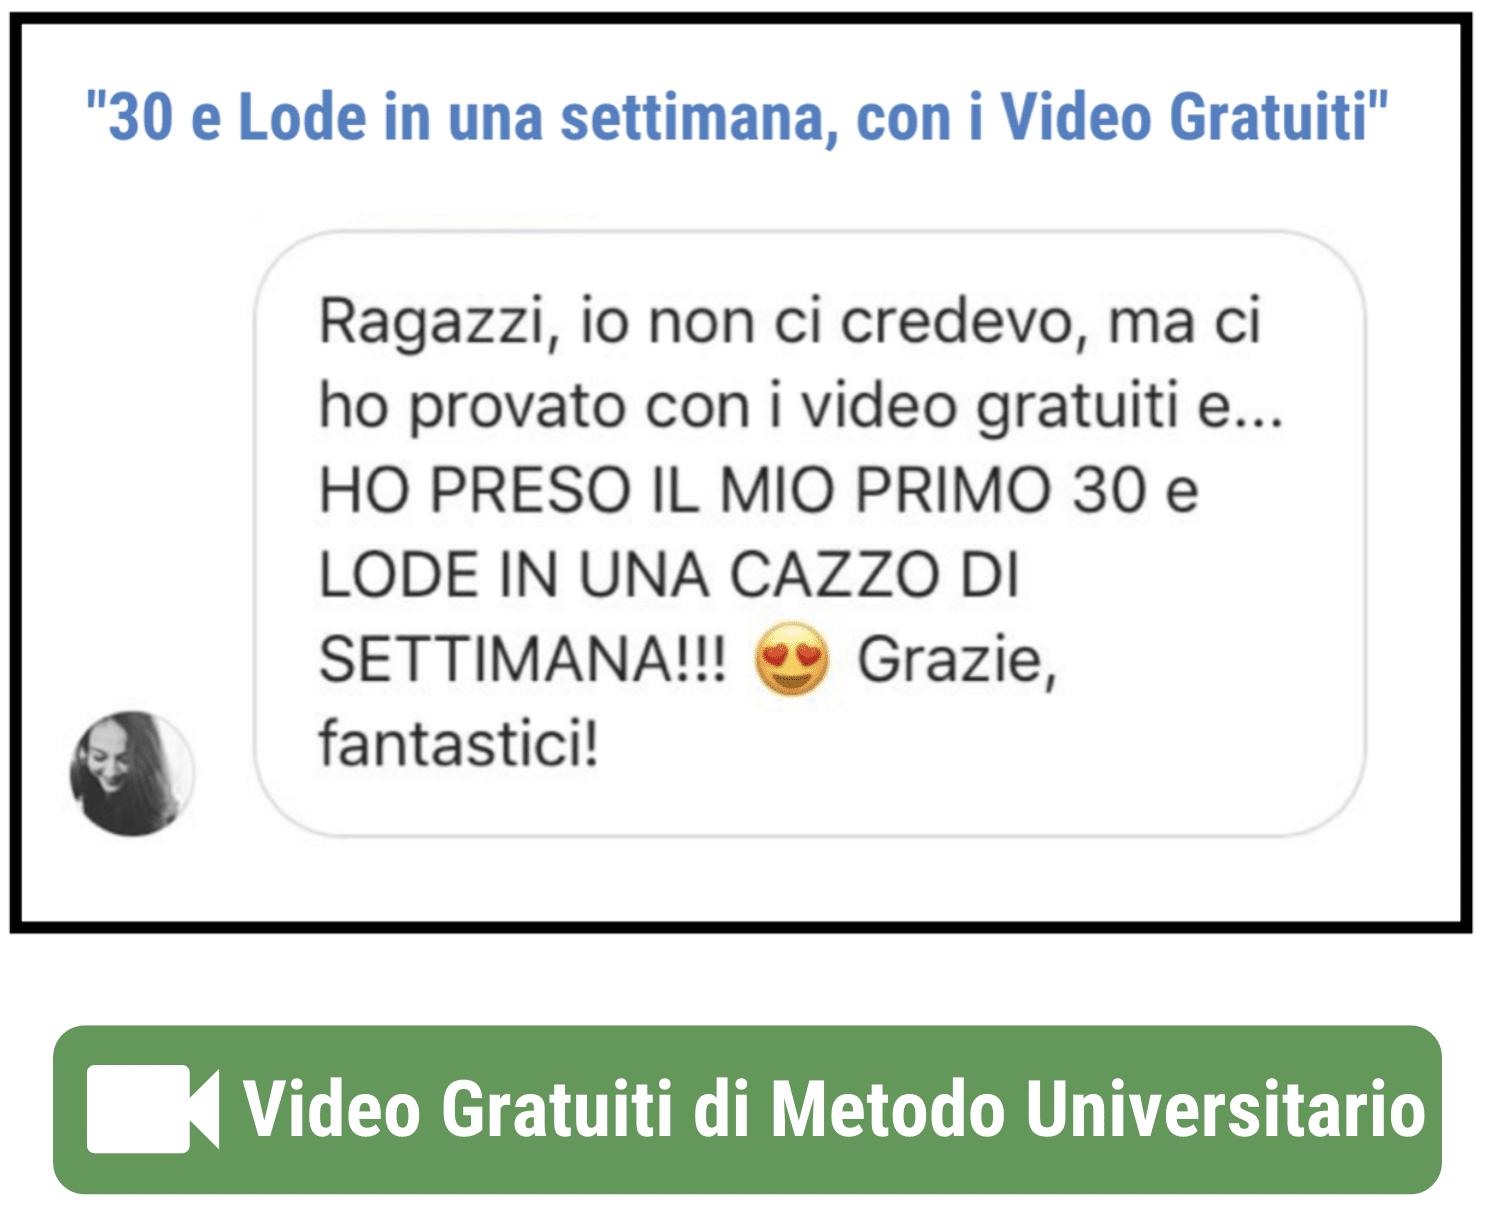 Test 1 - Metodo di Studio Universitario: la Guida Definitiva n.1 in Italia [OCME]